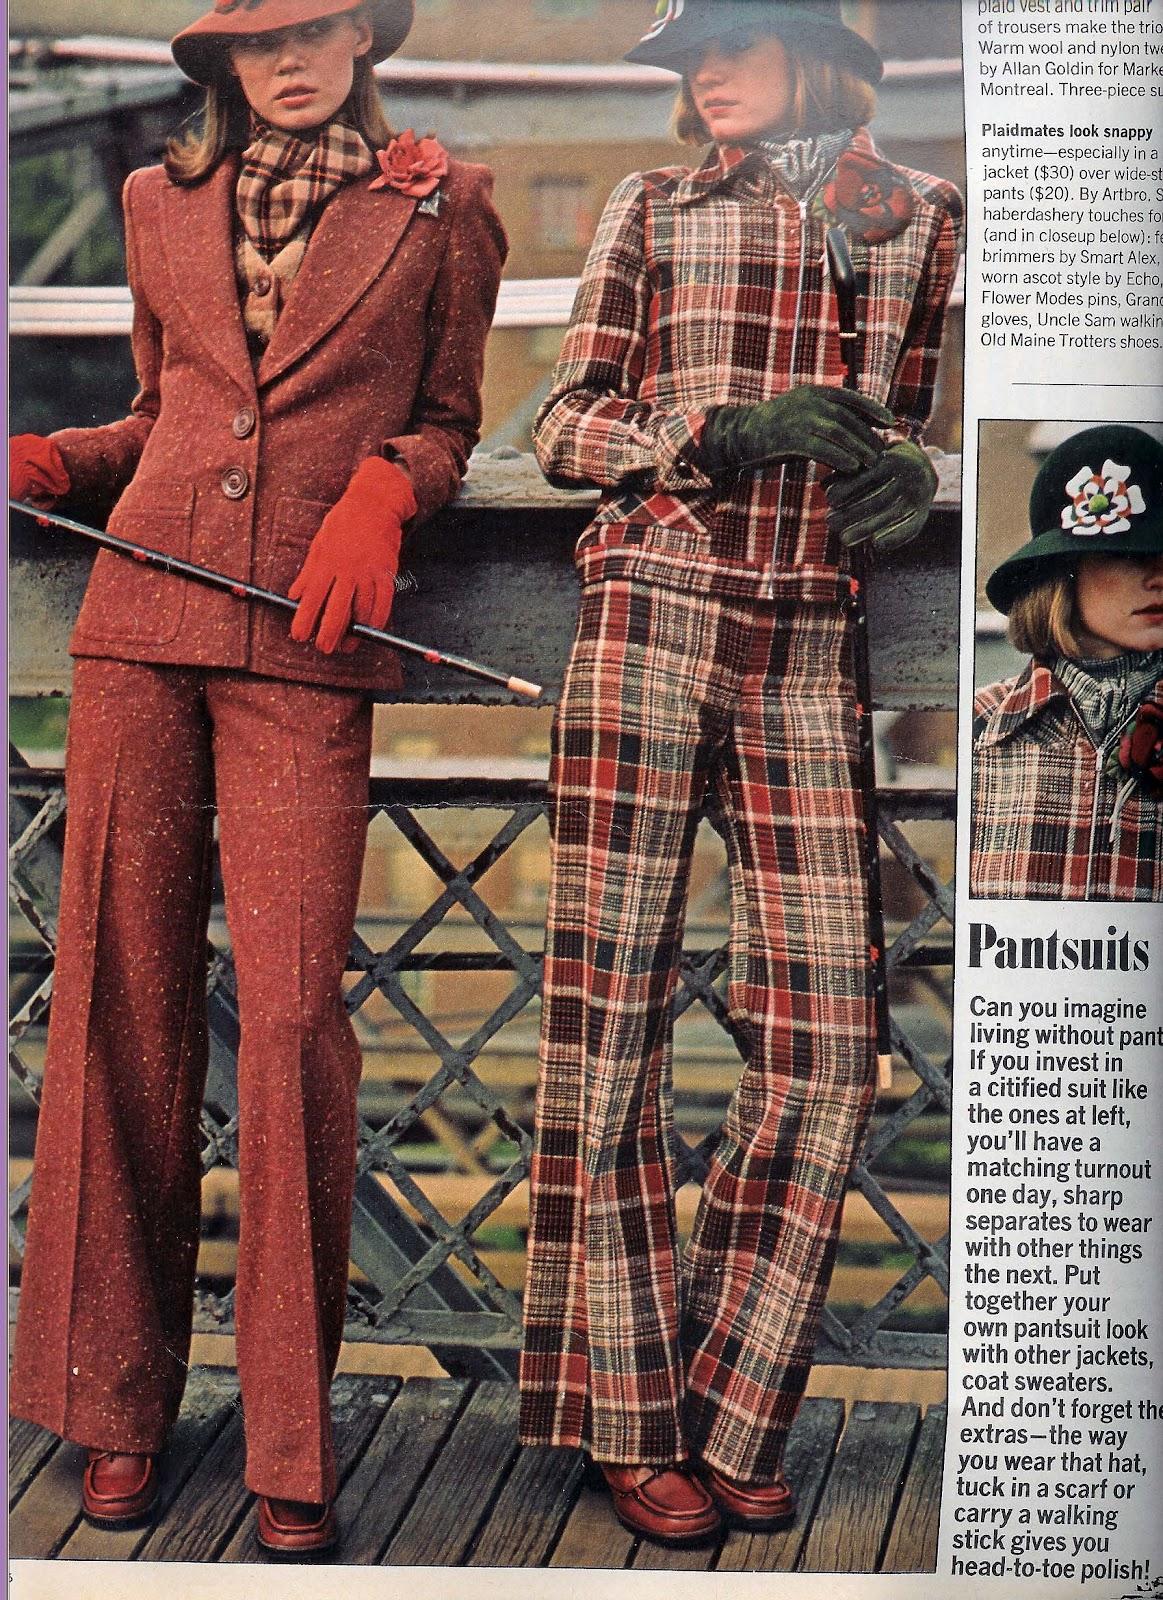 Greatest Fashion Photographers: Vogue, Harper's Bazaar 1970 s fashion magazines